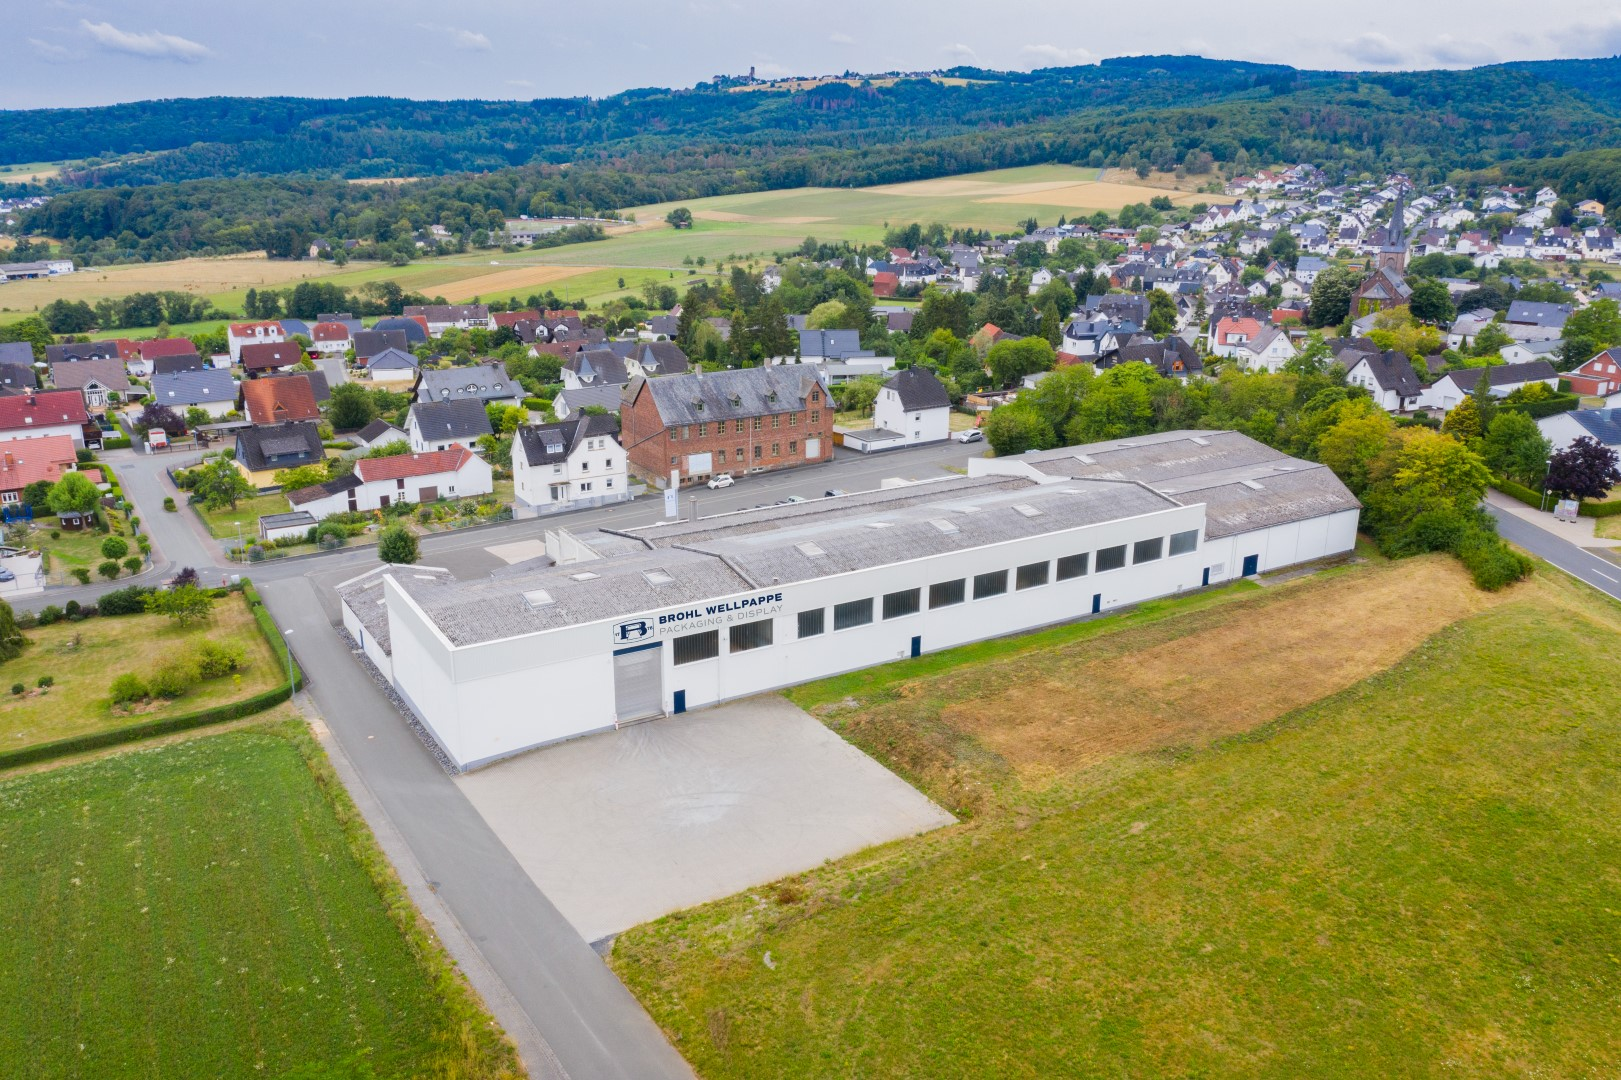 Standort Fleisbach Brohl Wellpappe